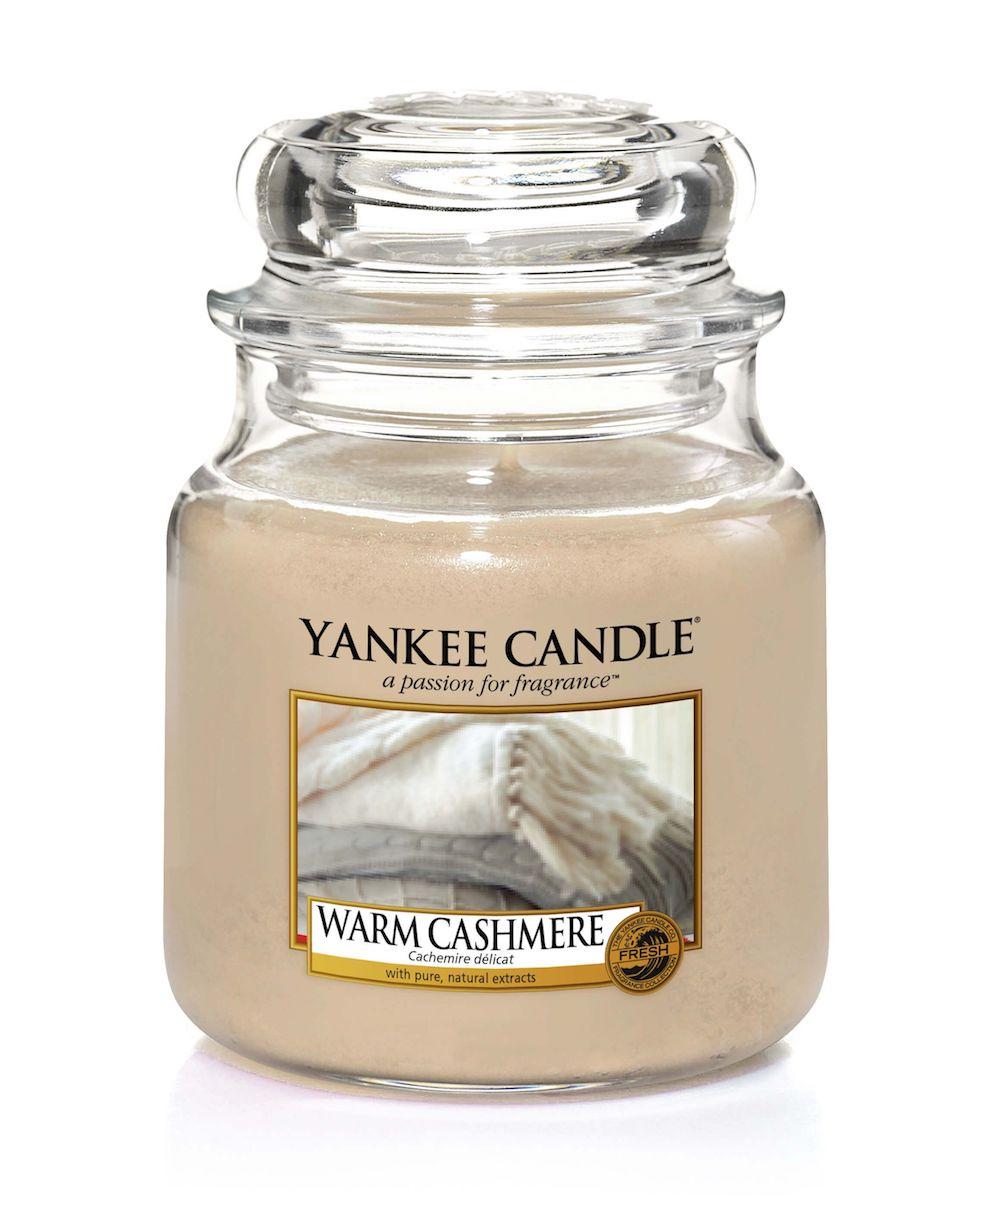 Svíčka Warm Cashmere - Yankee Candle